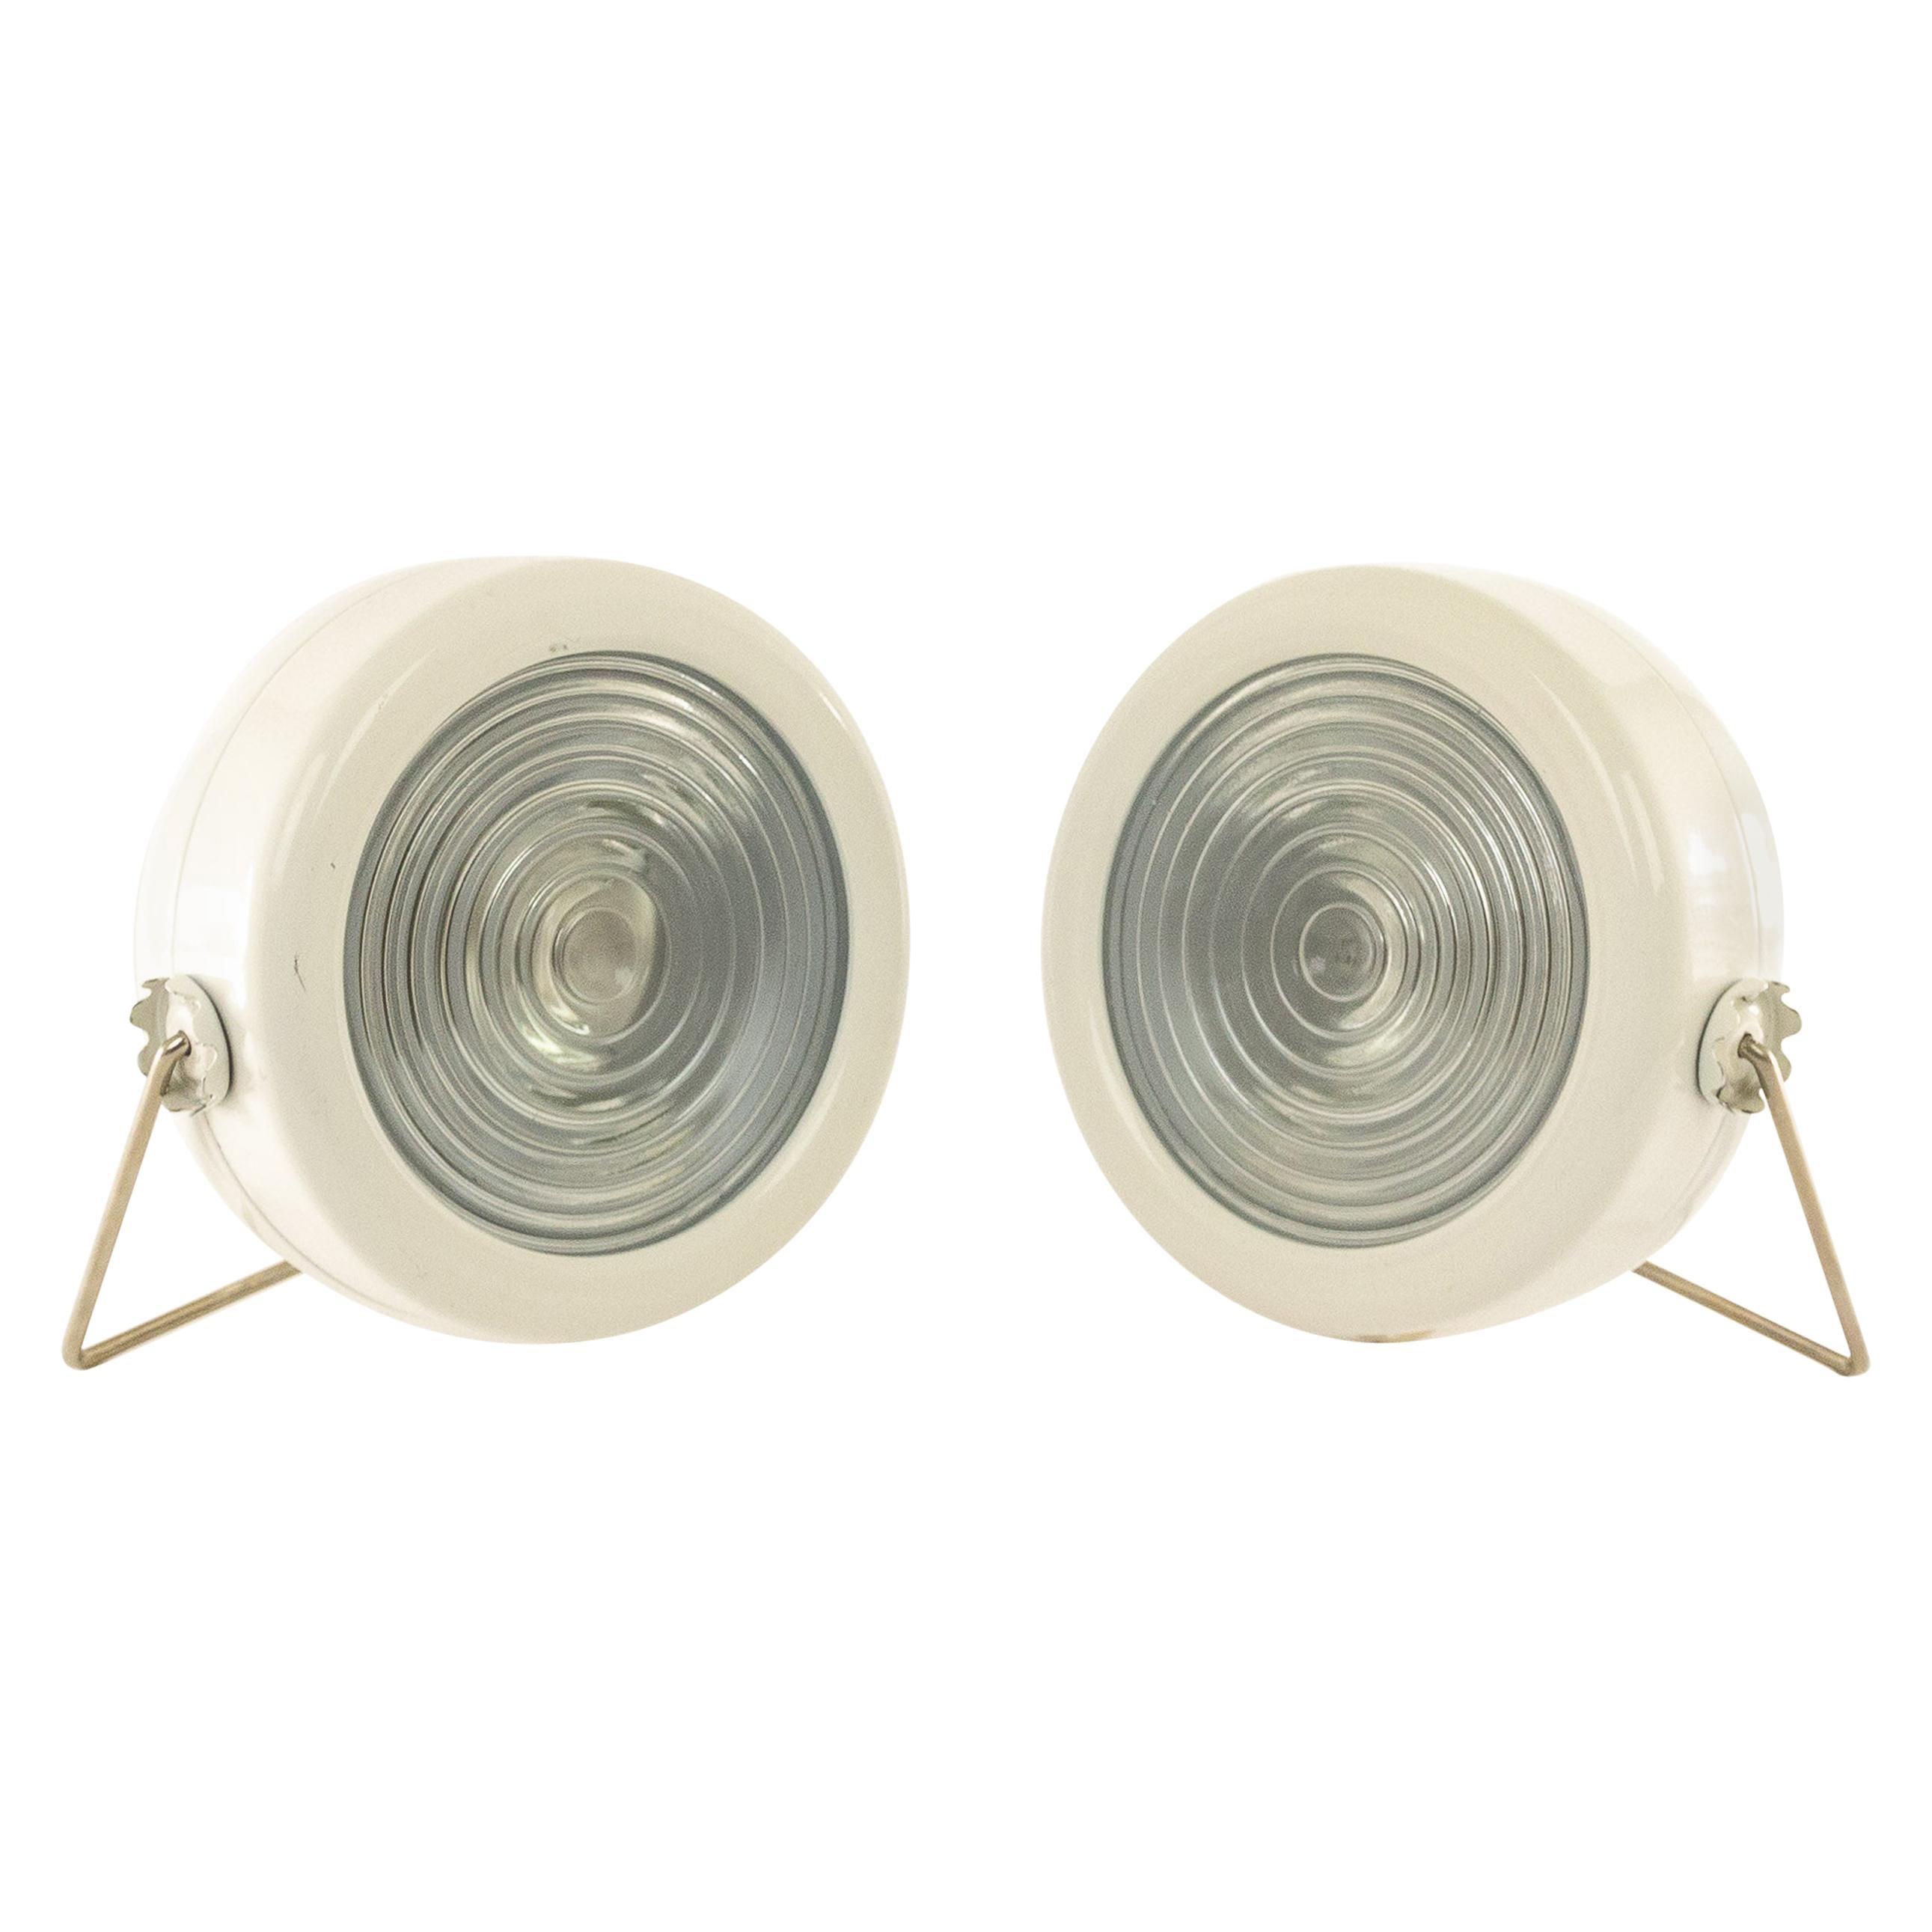 Pair of Sciuko Table Lamps by Achille & Pier Giacomo Castiglioni for Flos, 1966